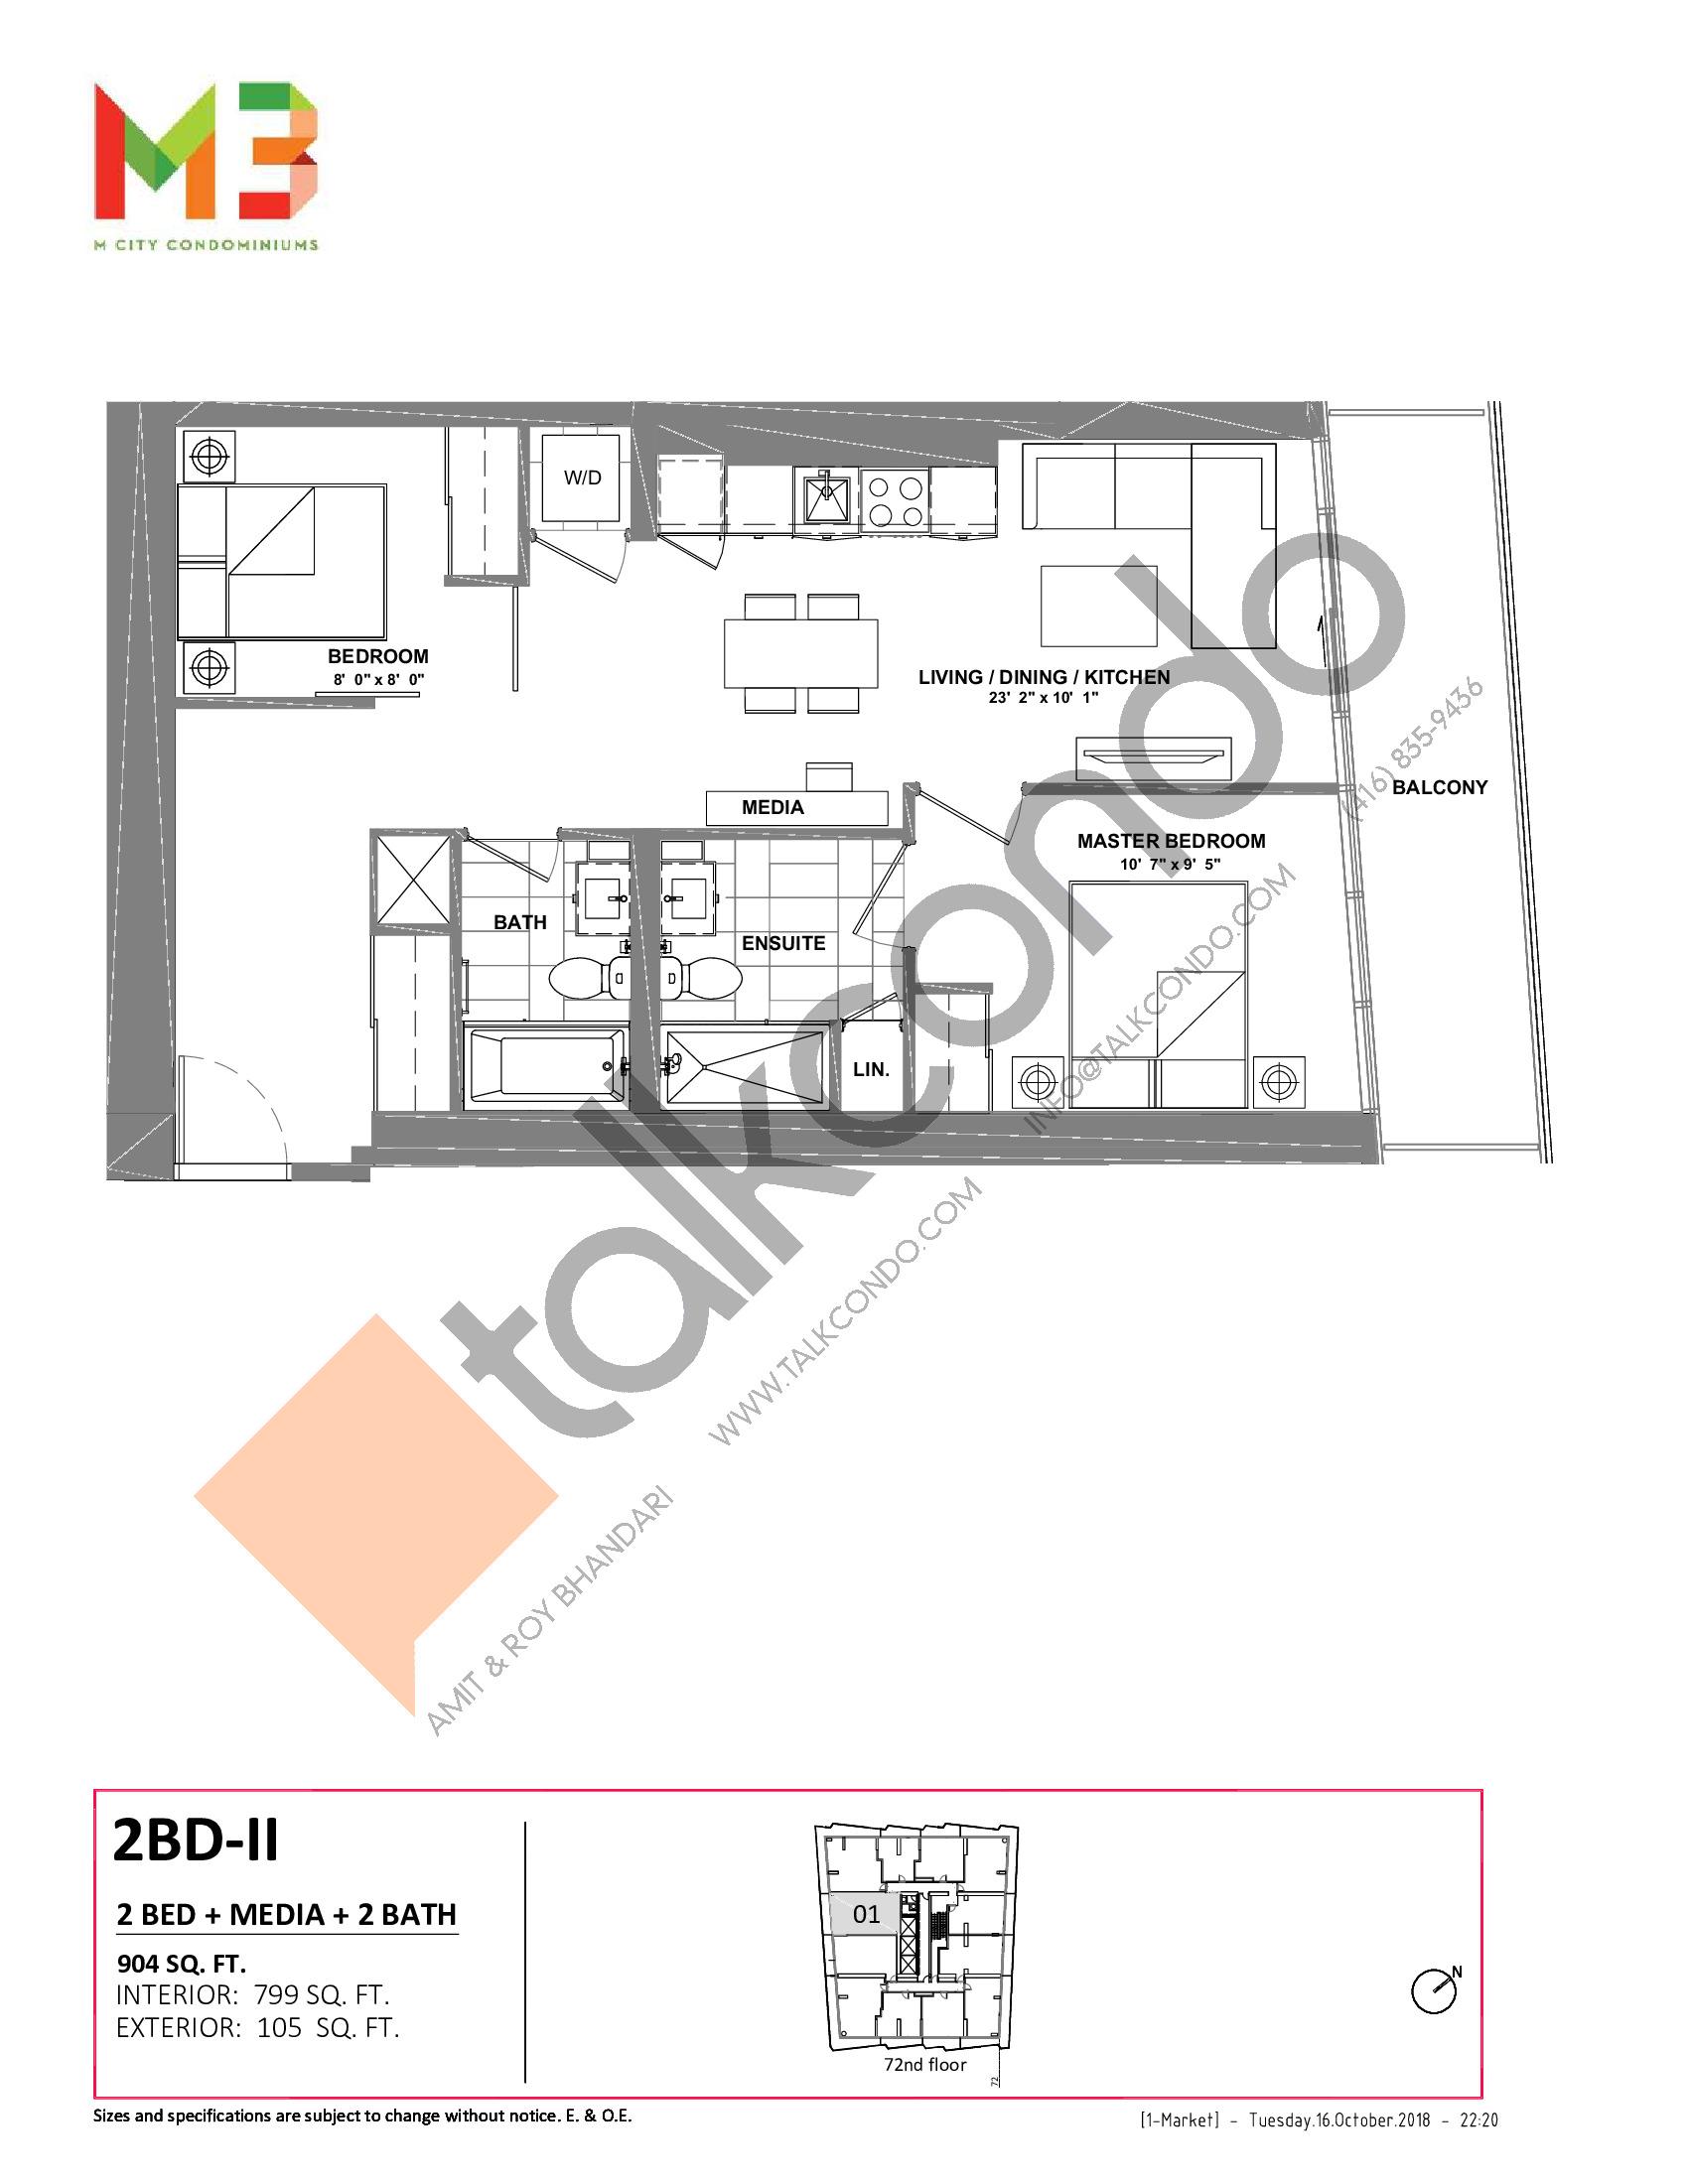 2BD-II Floor Plan at M3 Condos - 799 sq.ft